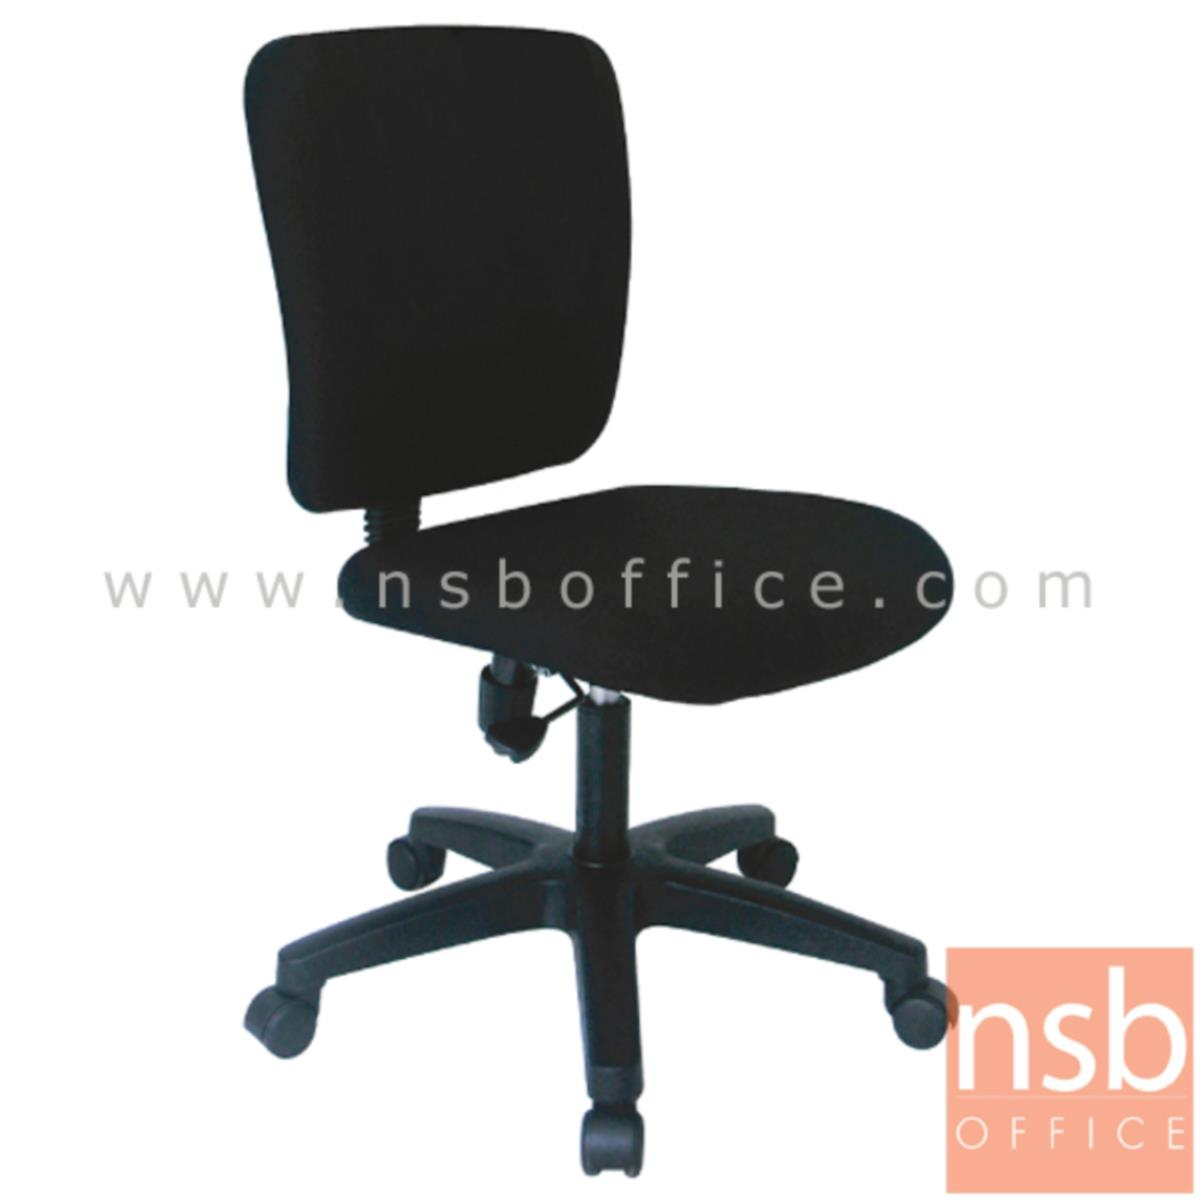 B03A430:เก้าอี้สำนักงาน รุ่น Vitess (วิเทสส์)  โช๊คแก๊ส มีก้อนโยก ขาพลาสติก